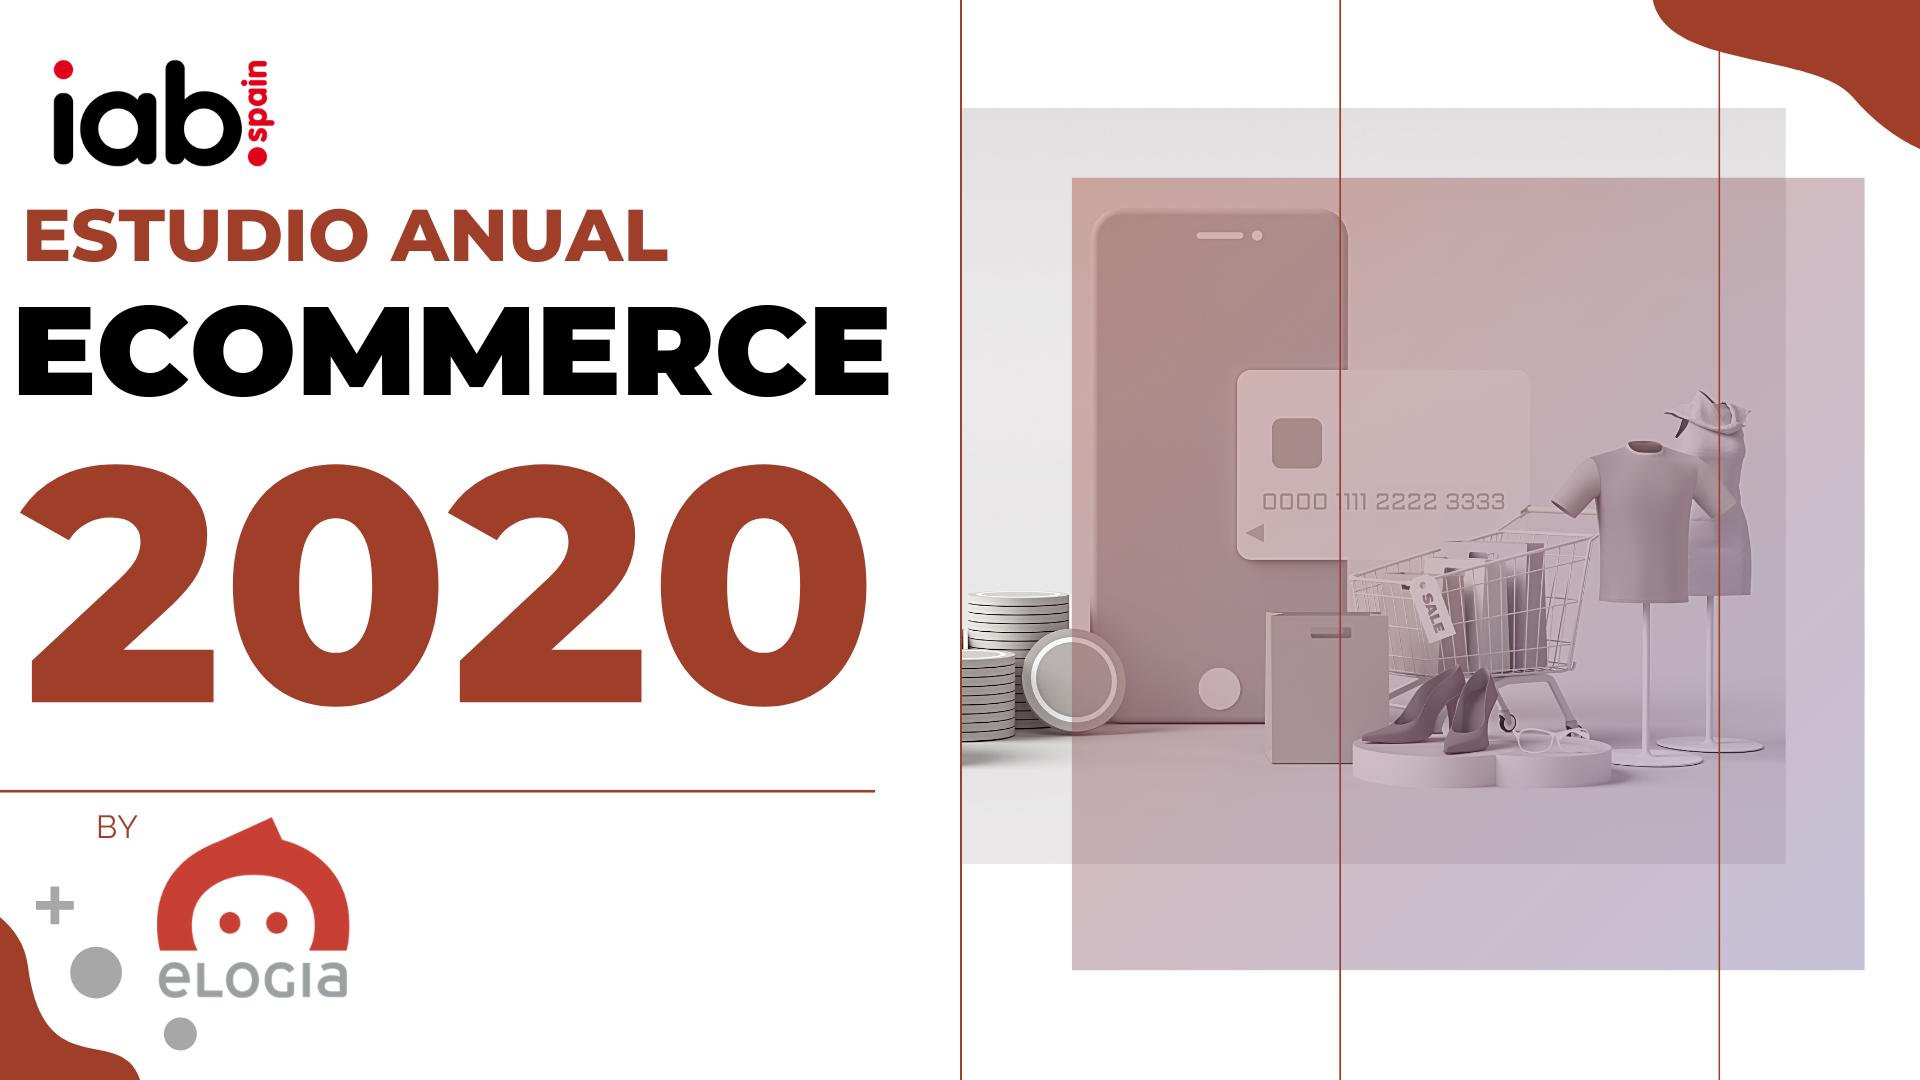 Estudio Anual eCommerce 2020 IAB by Elogia